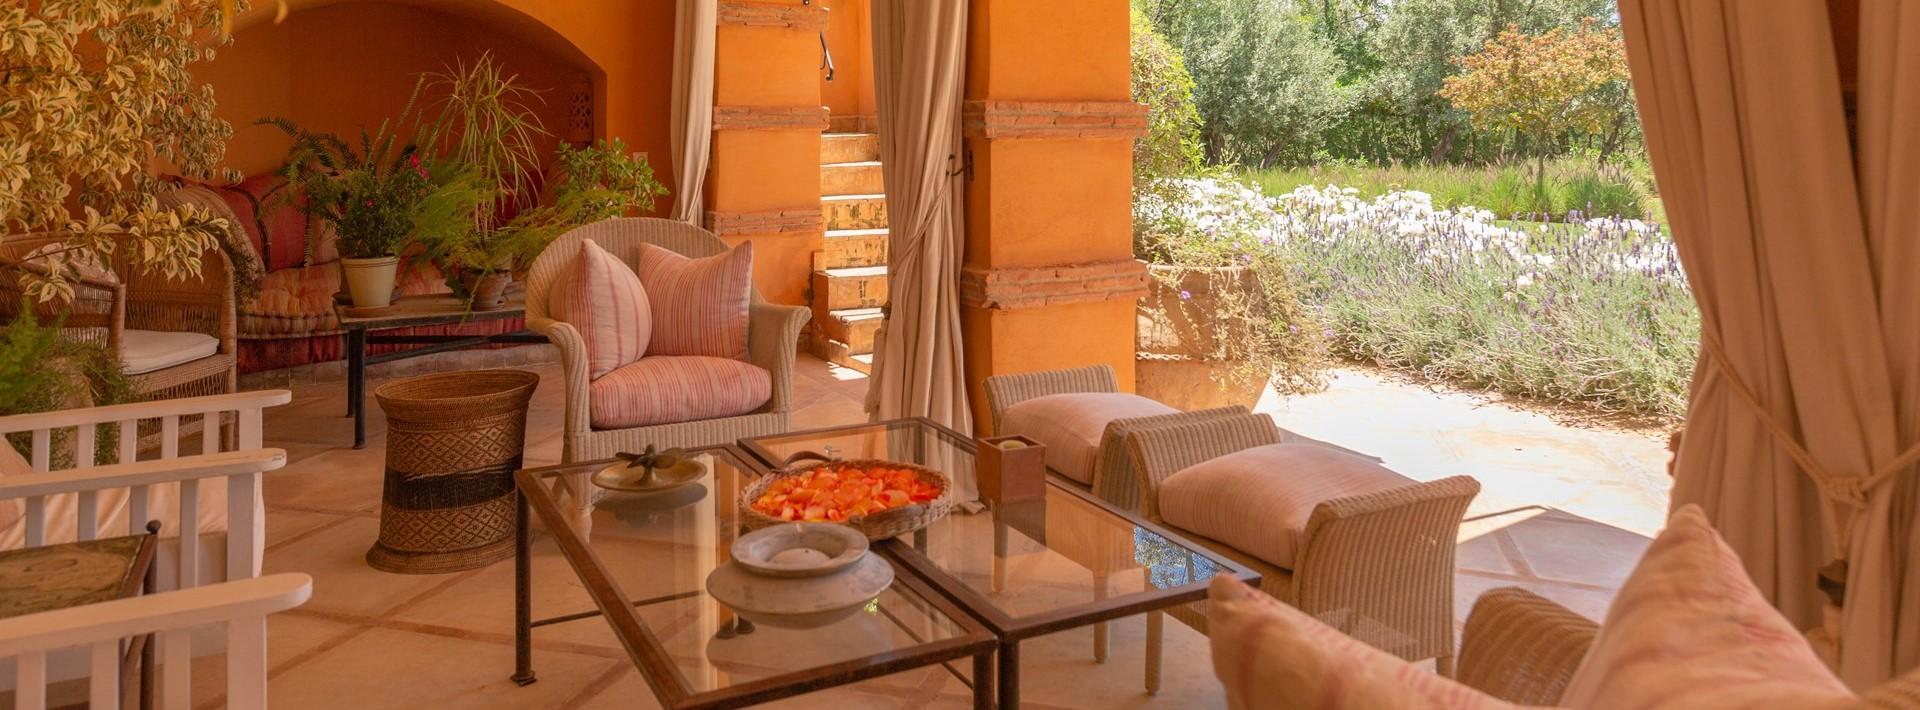 villa-dar-tourtite-terrace-seating